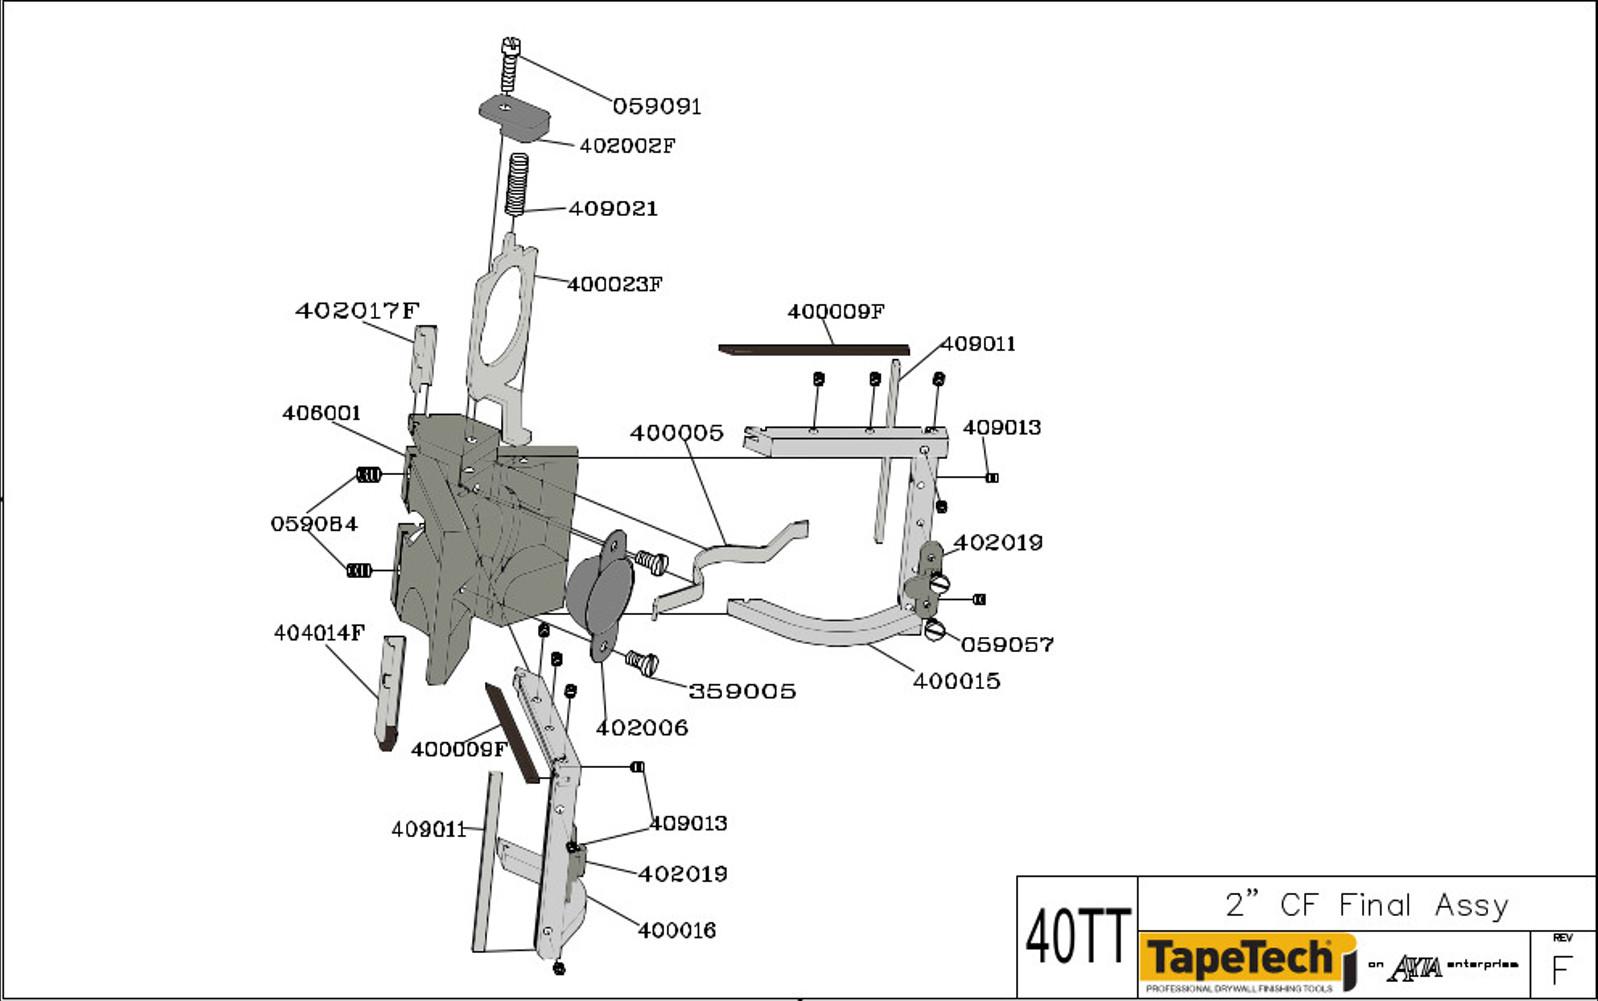 Tapetech Angle Head Parts